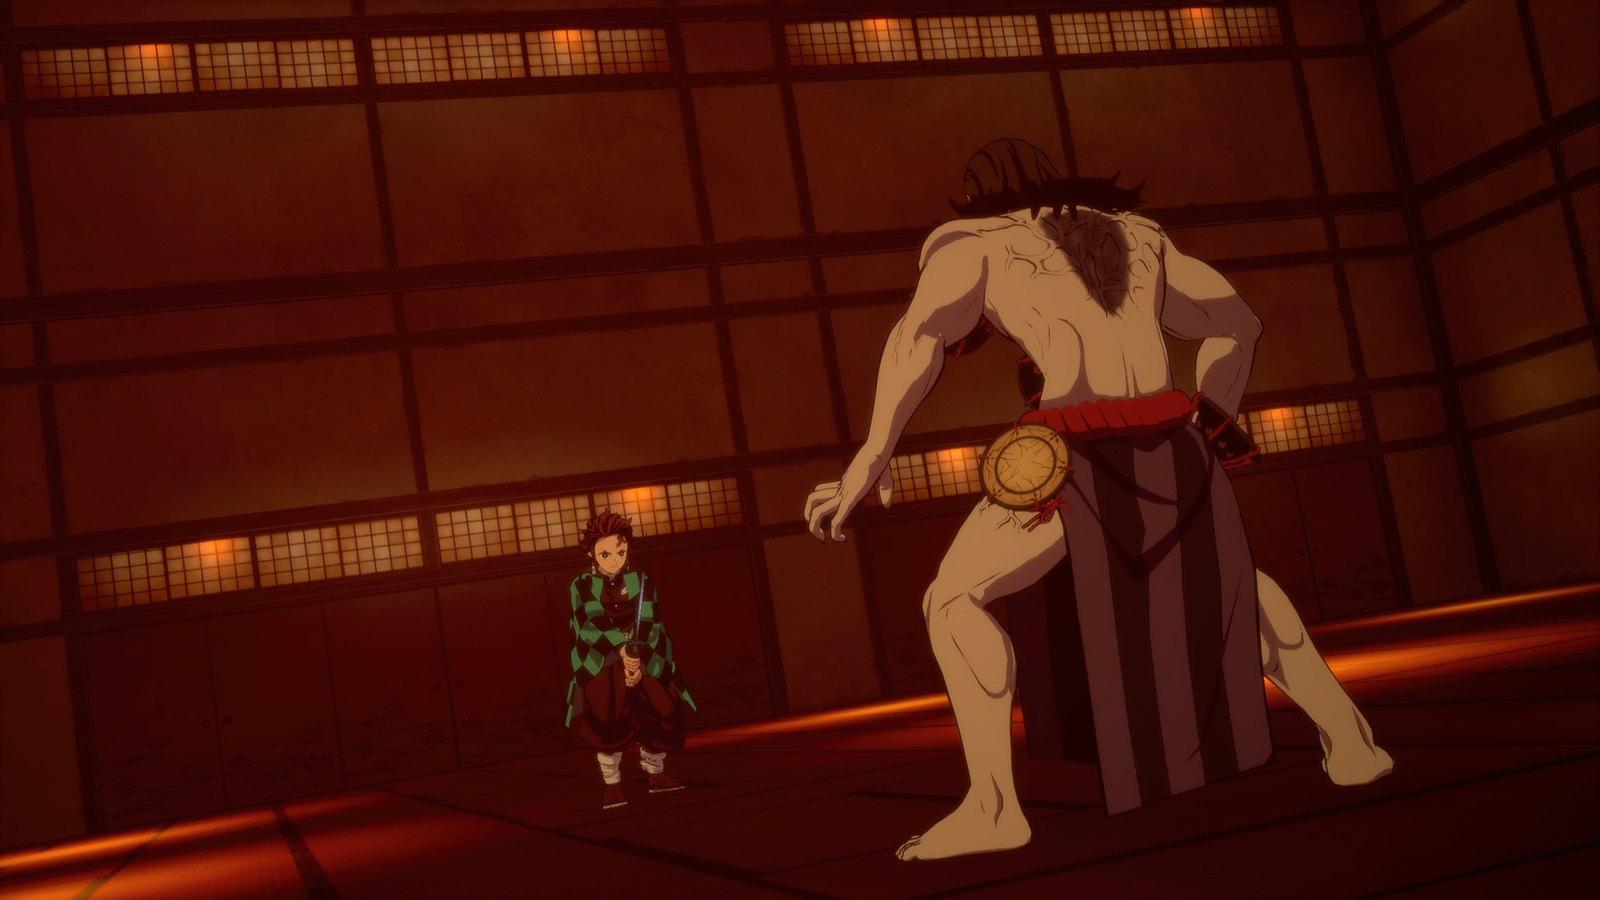 Demon Slayer - Kimetsu no Yaiba - The Hinokami Chronicles - Image 9